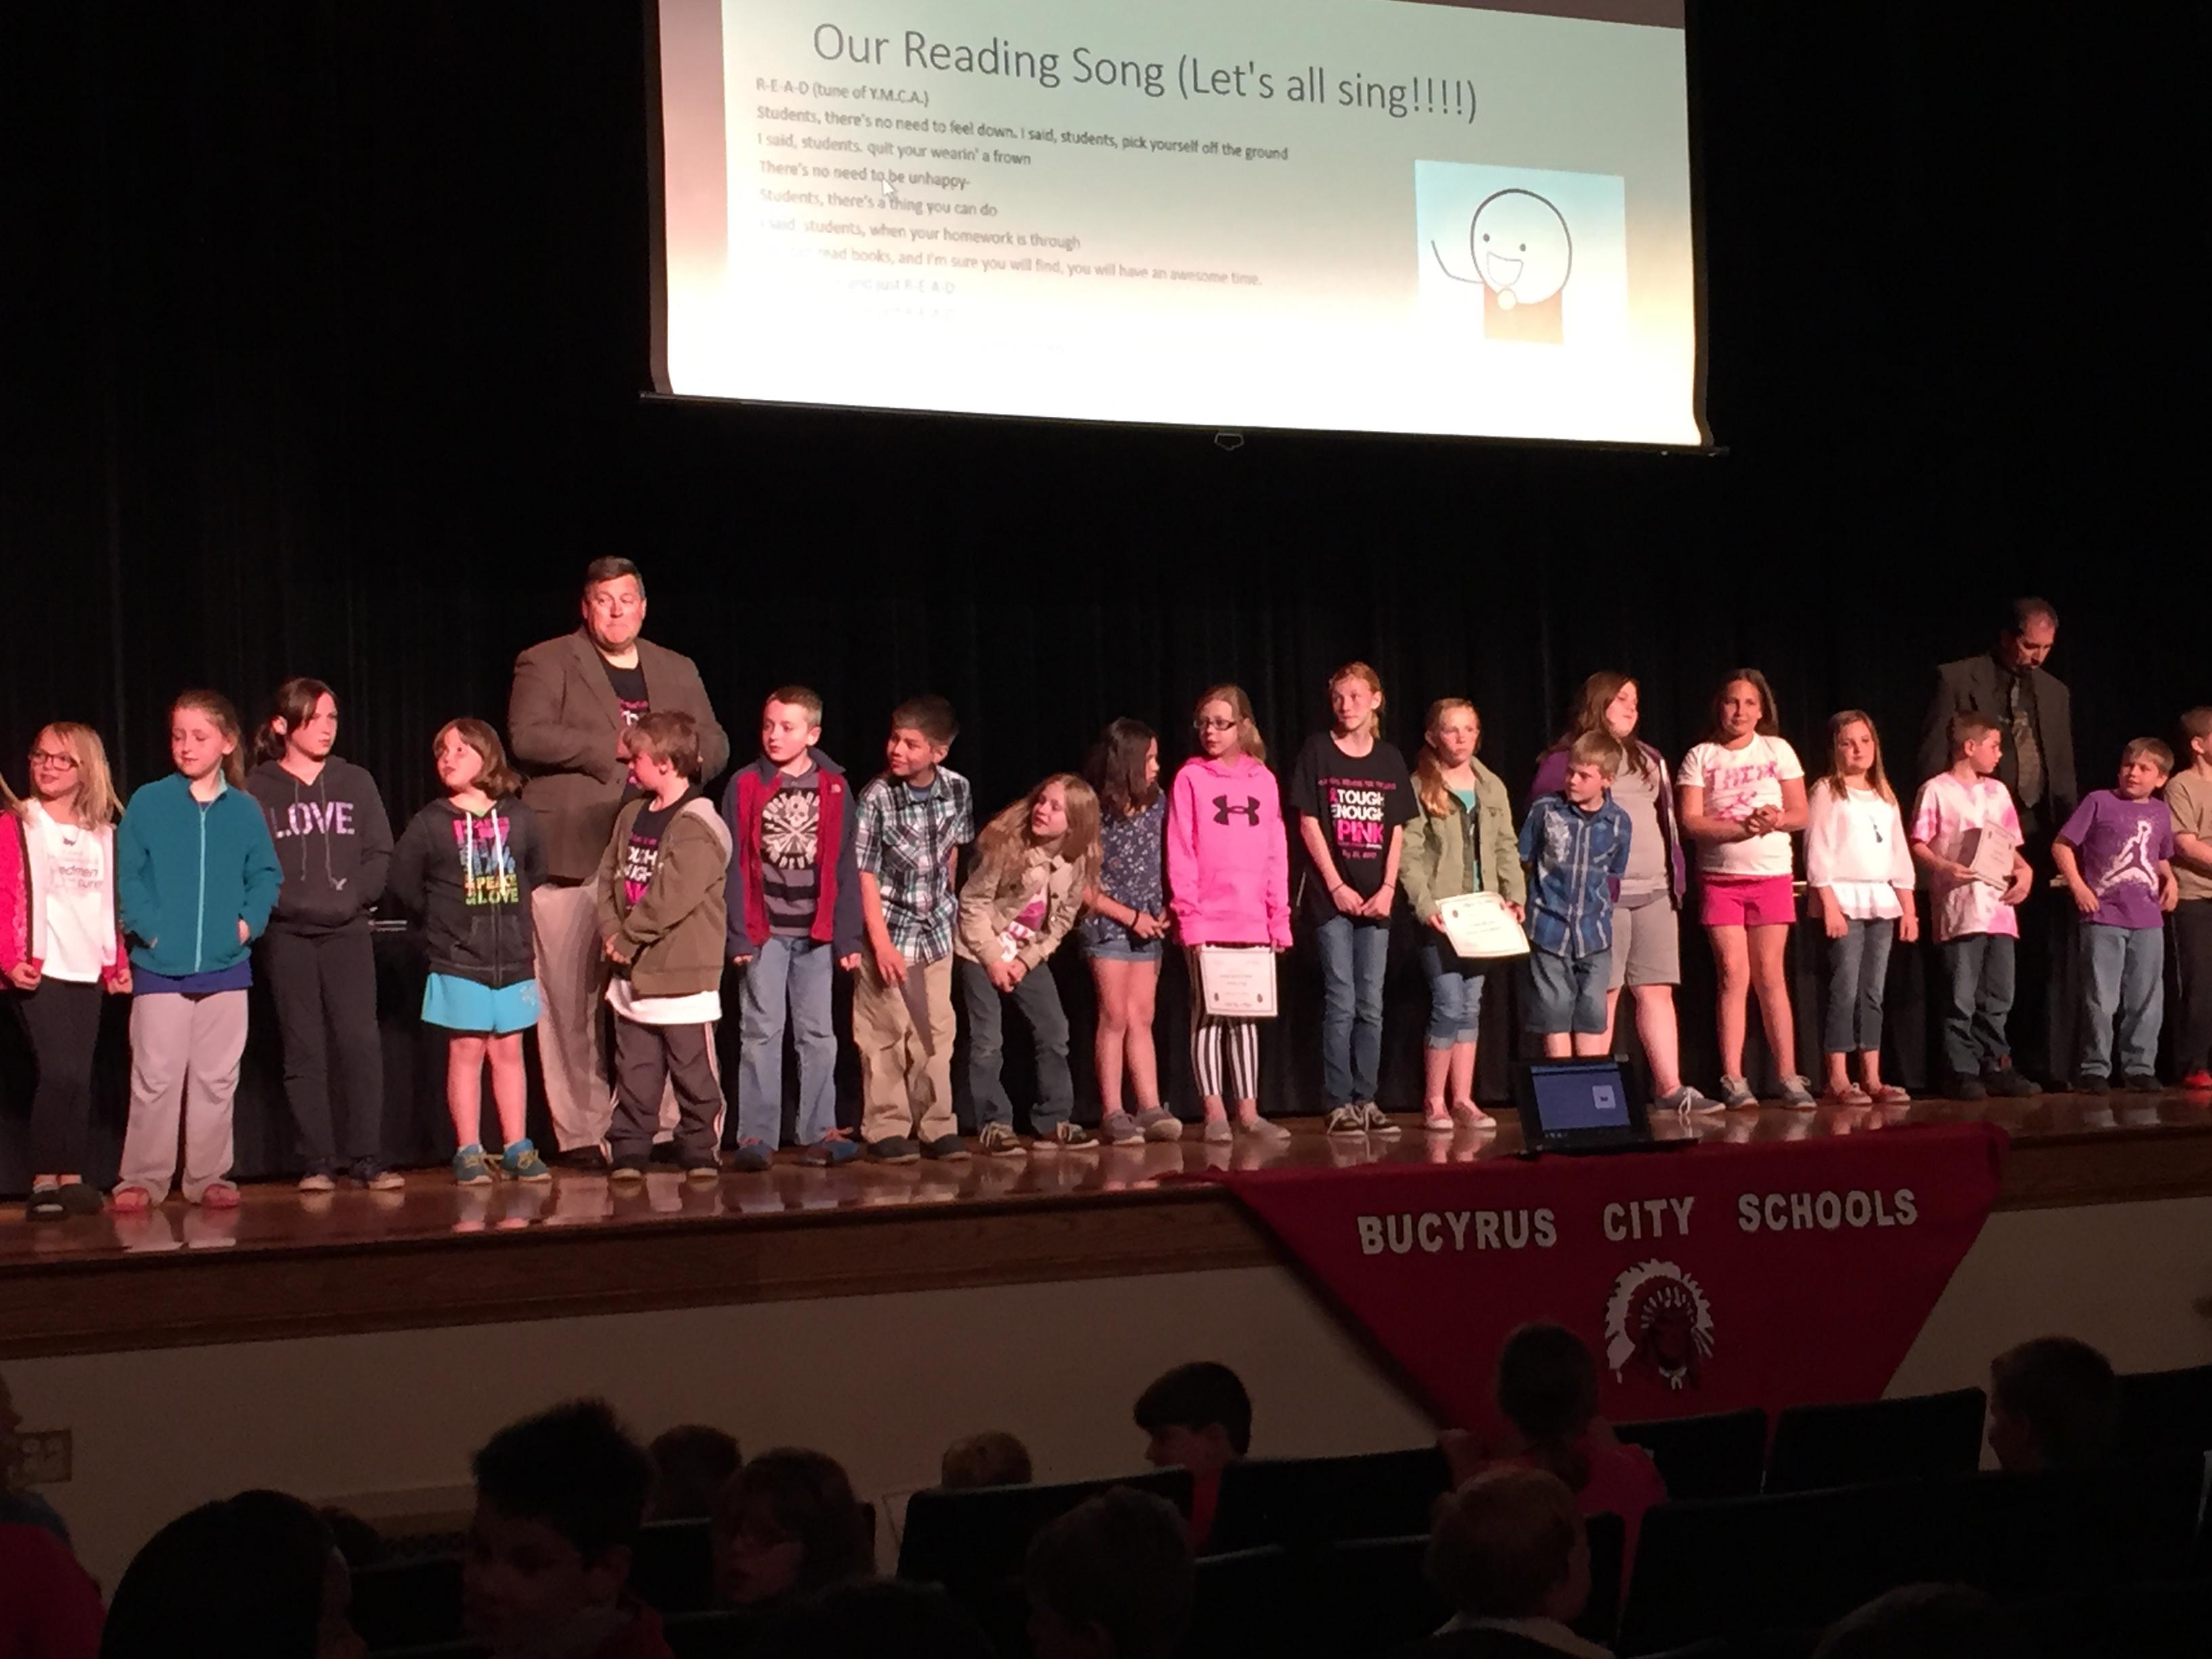 Bucyrus BOE reading pledge 05-21-15